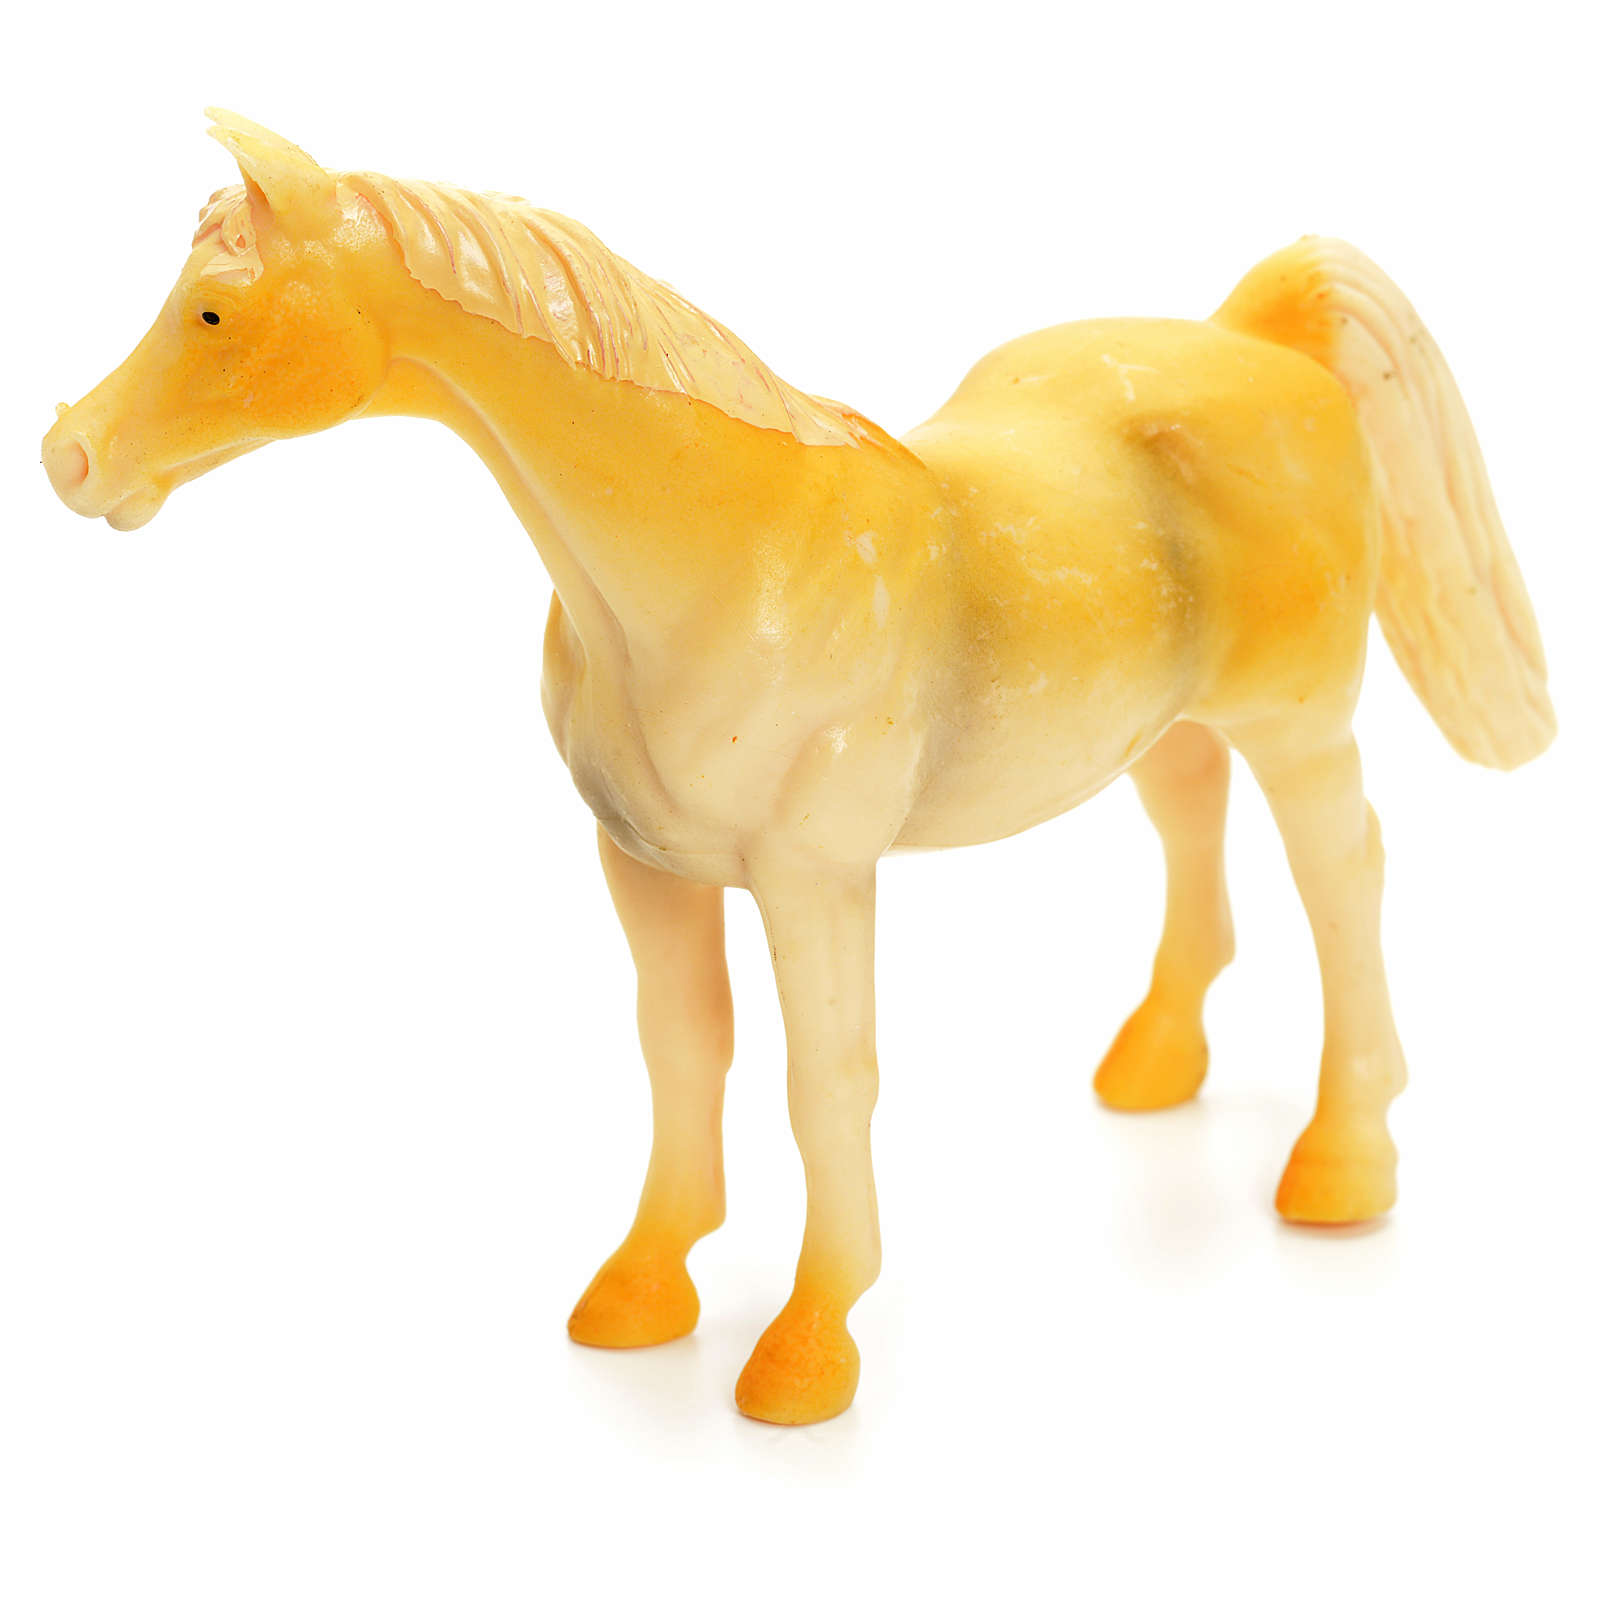 Cavallo beige 10 cm presepe 3